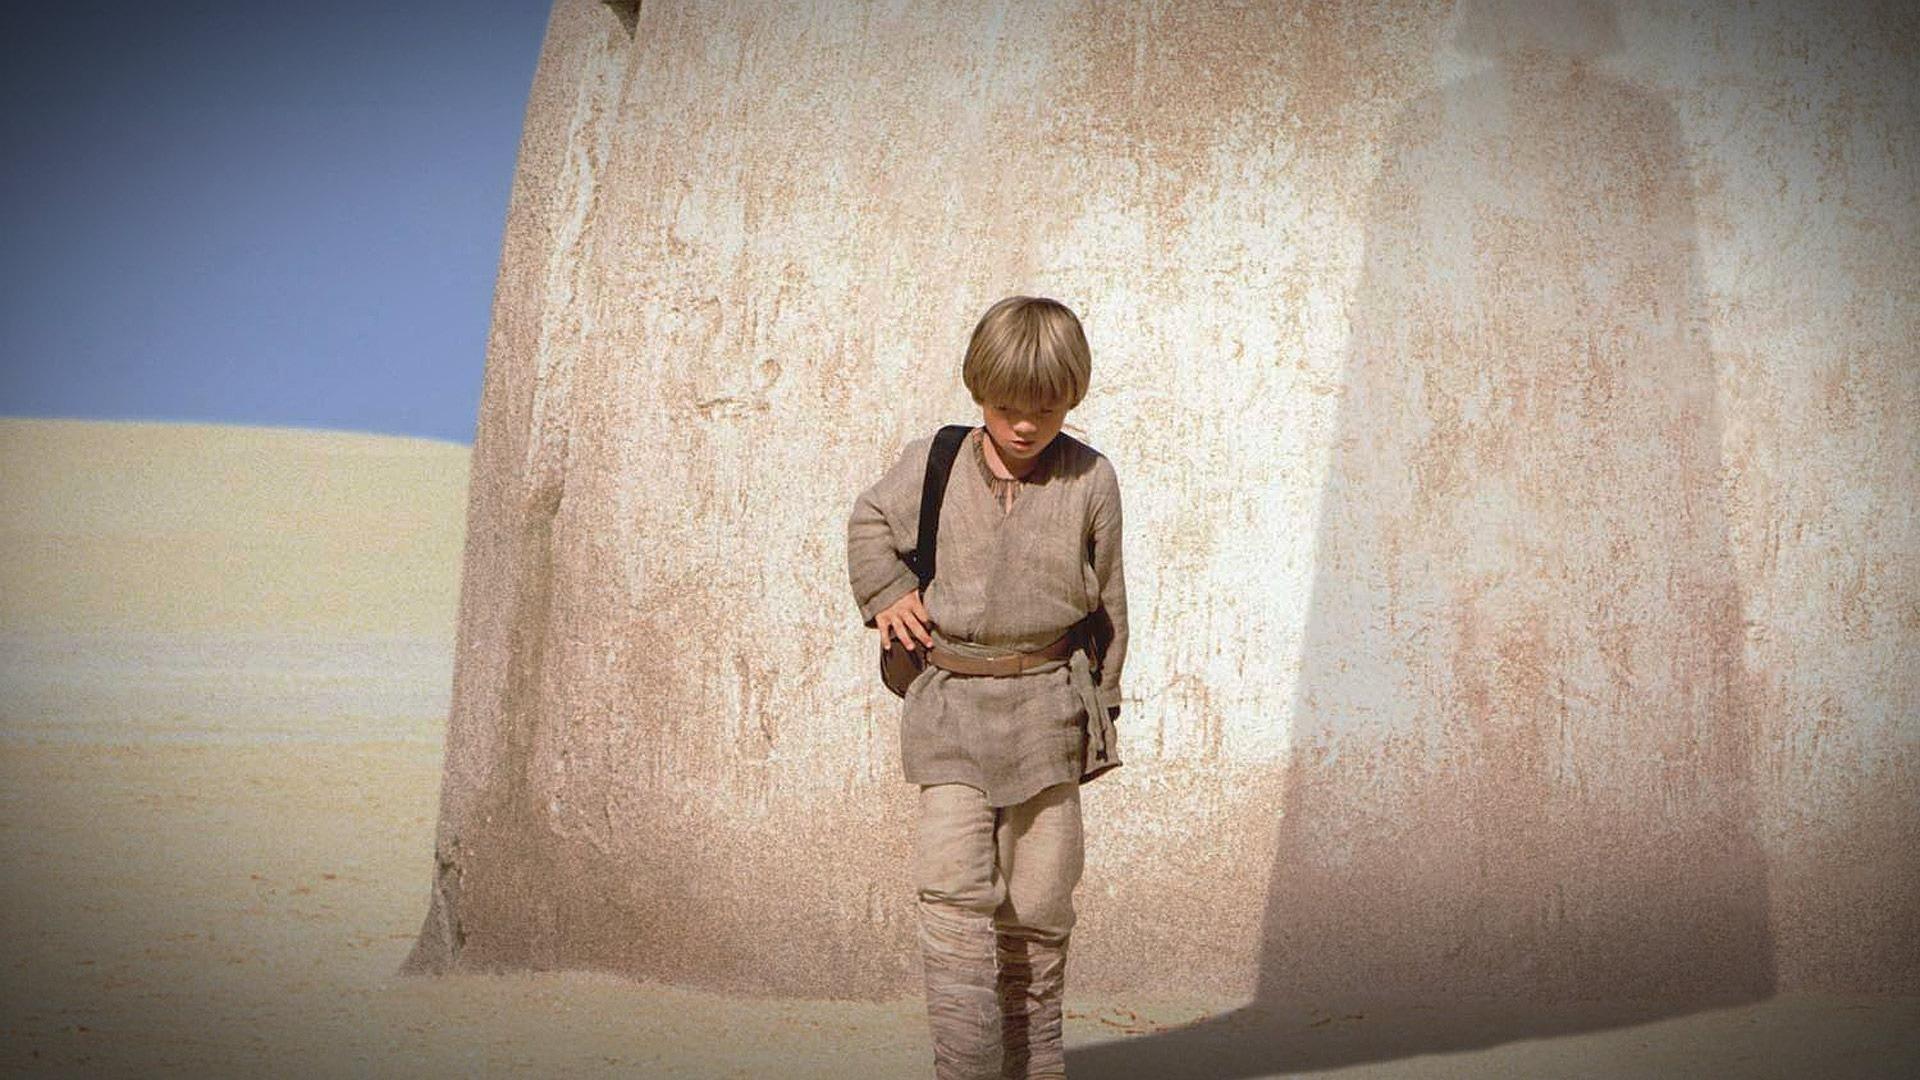 Movie - Star Wars Episode I: The Phantom Menace  Star Wars Anakin Skywalker Darth Vader Wallpaper